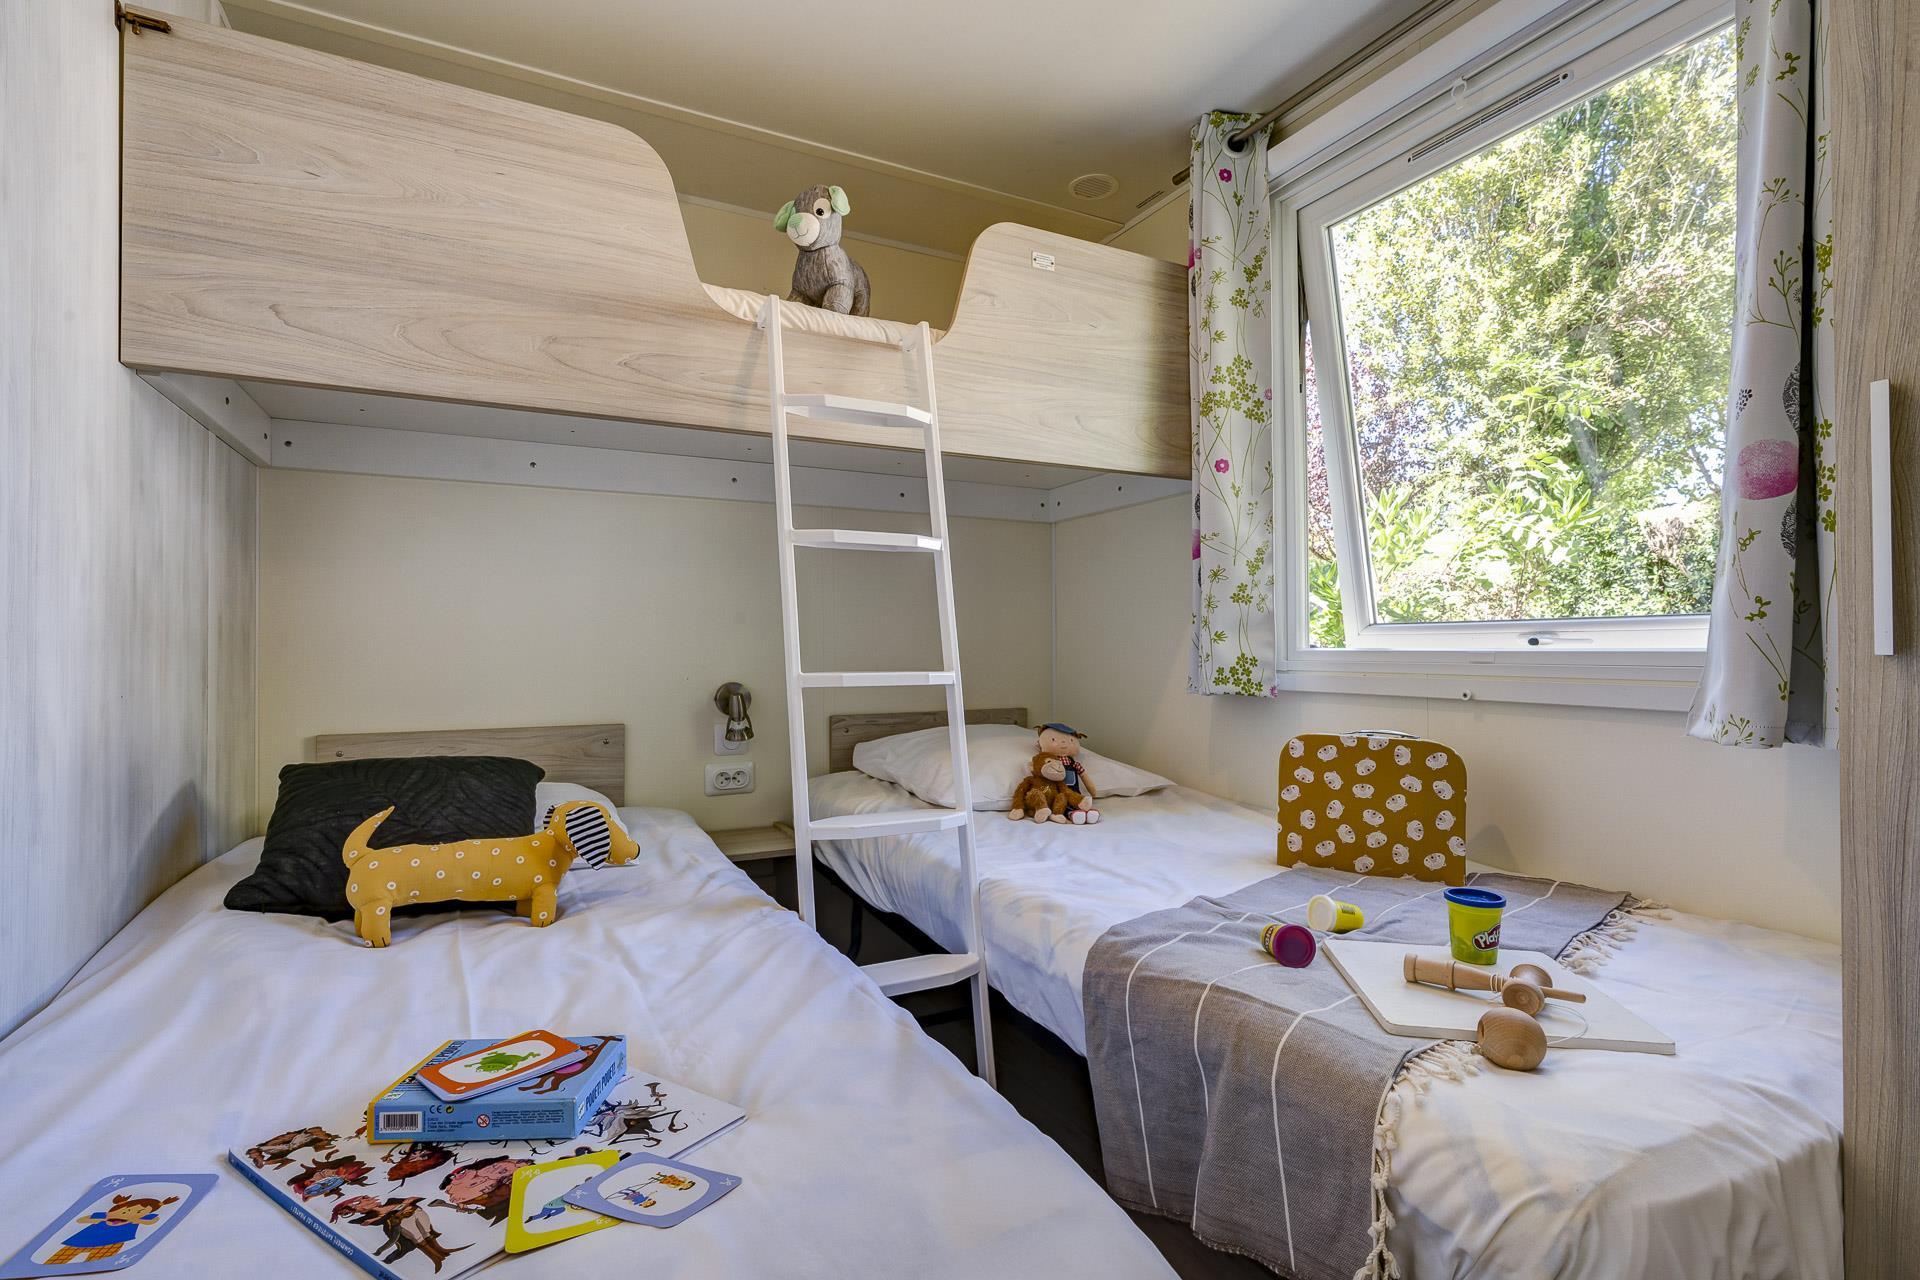 Location - Cottage 2 Chambres **** - Camping Sandaya Séquoia Parc